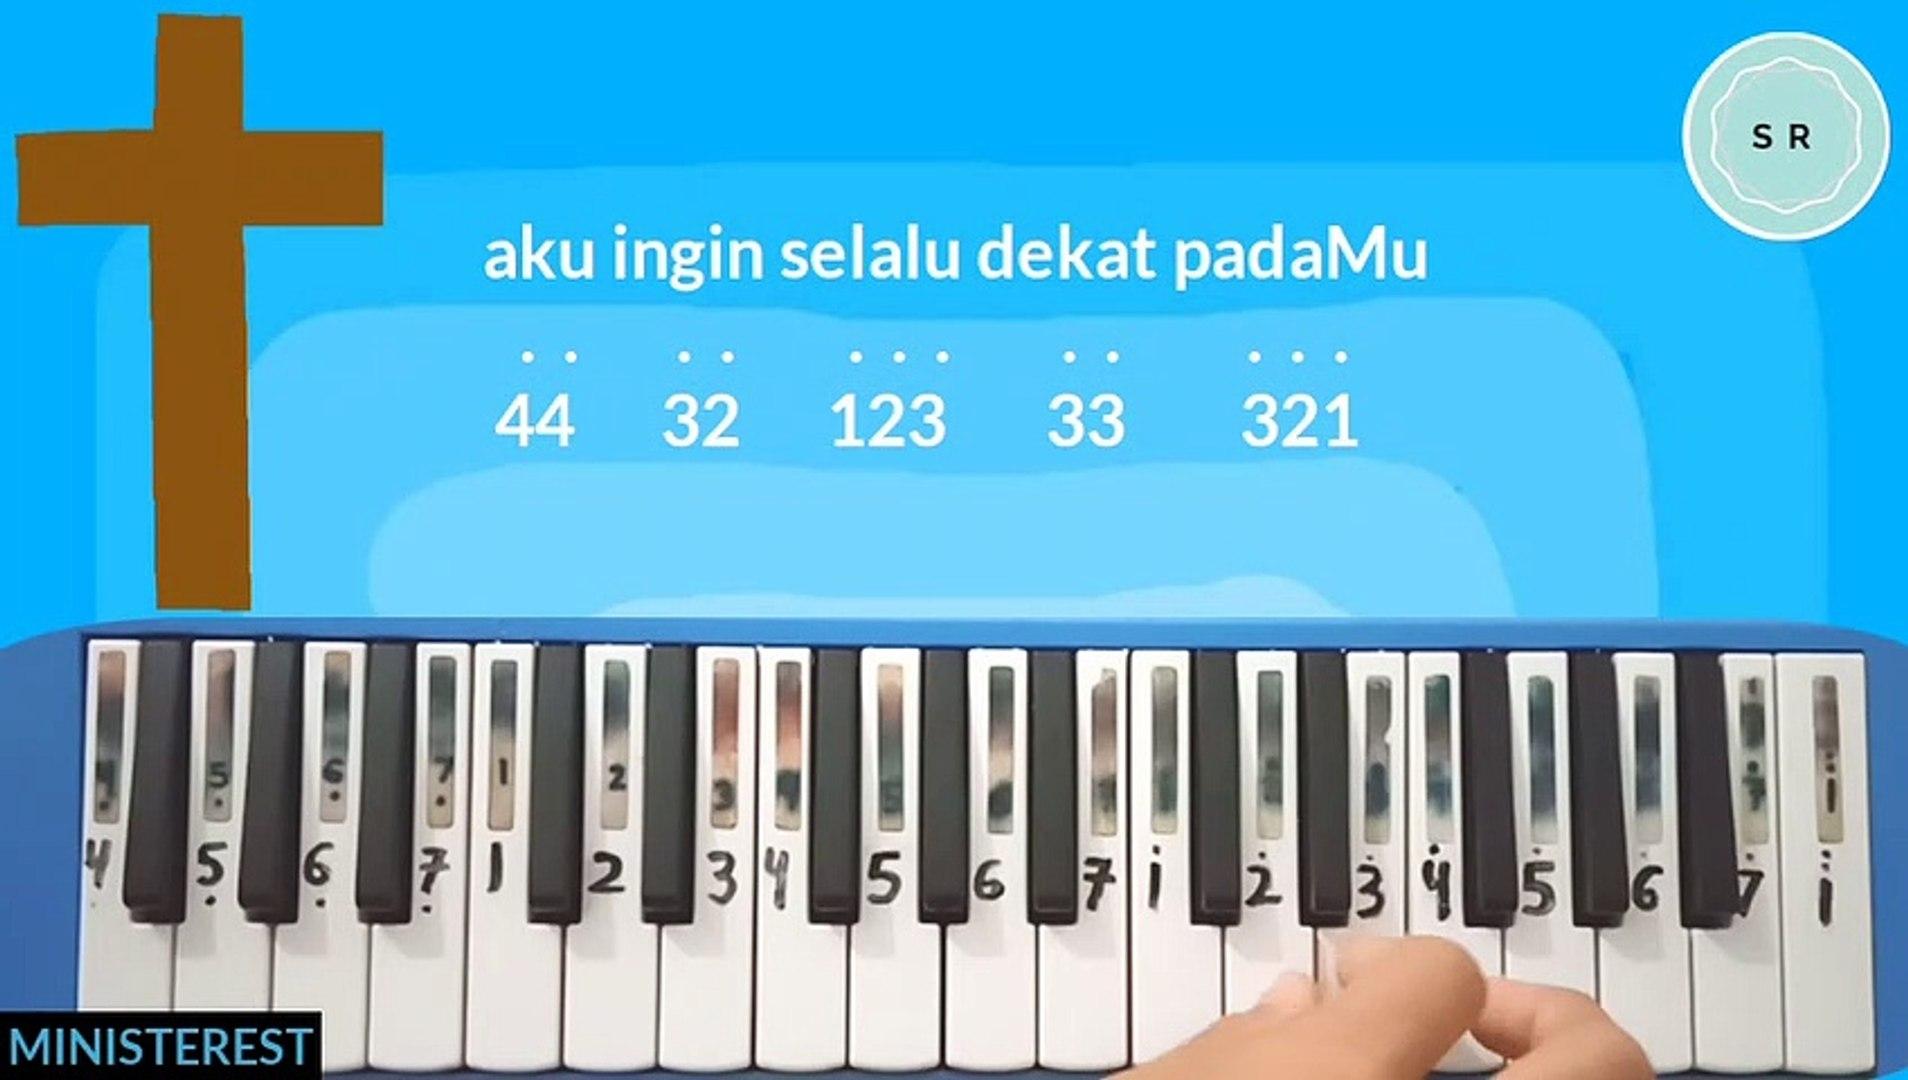 Not Pianika Lagu Ujilah Aku Tuhan Jclf Lagu Rohani Video Dailymotion